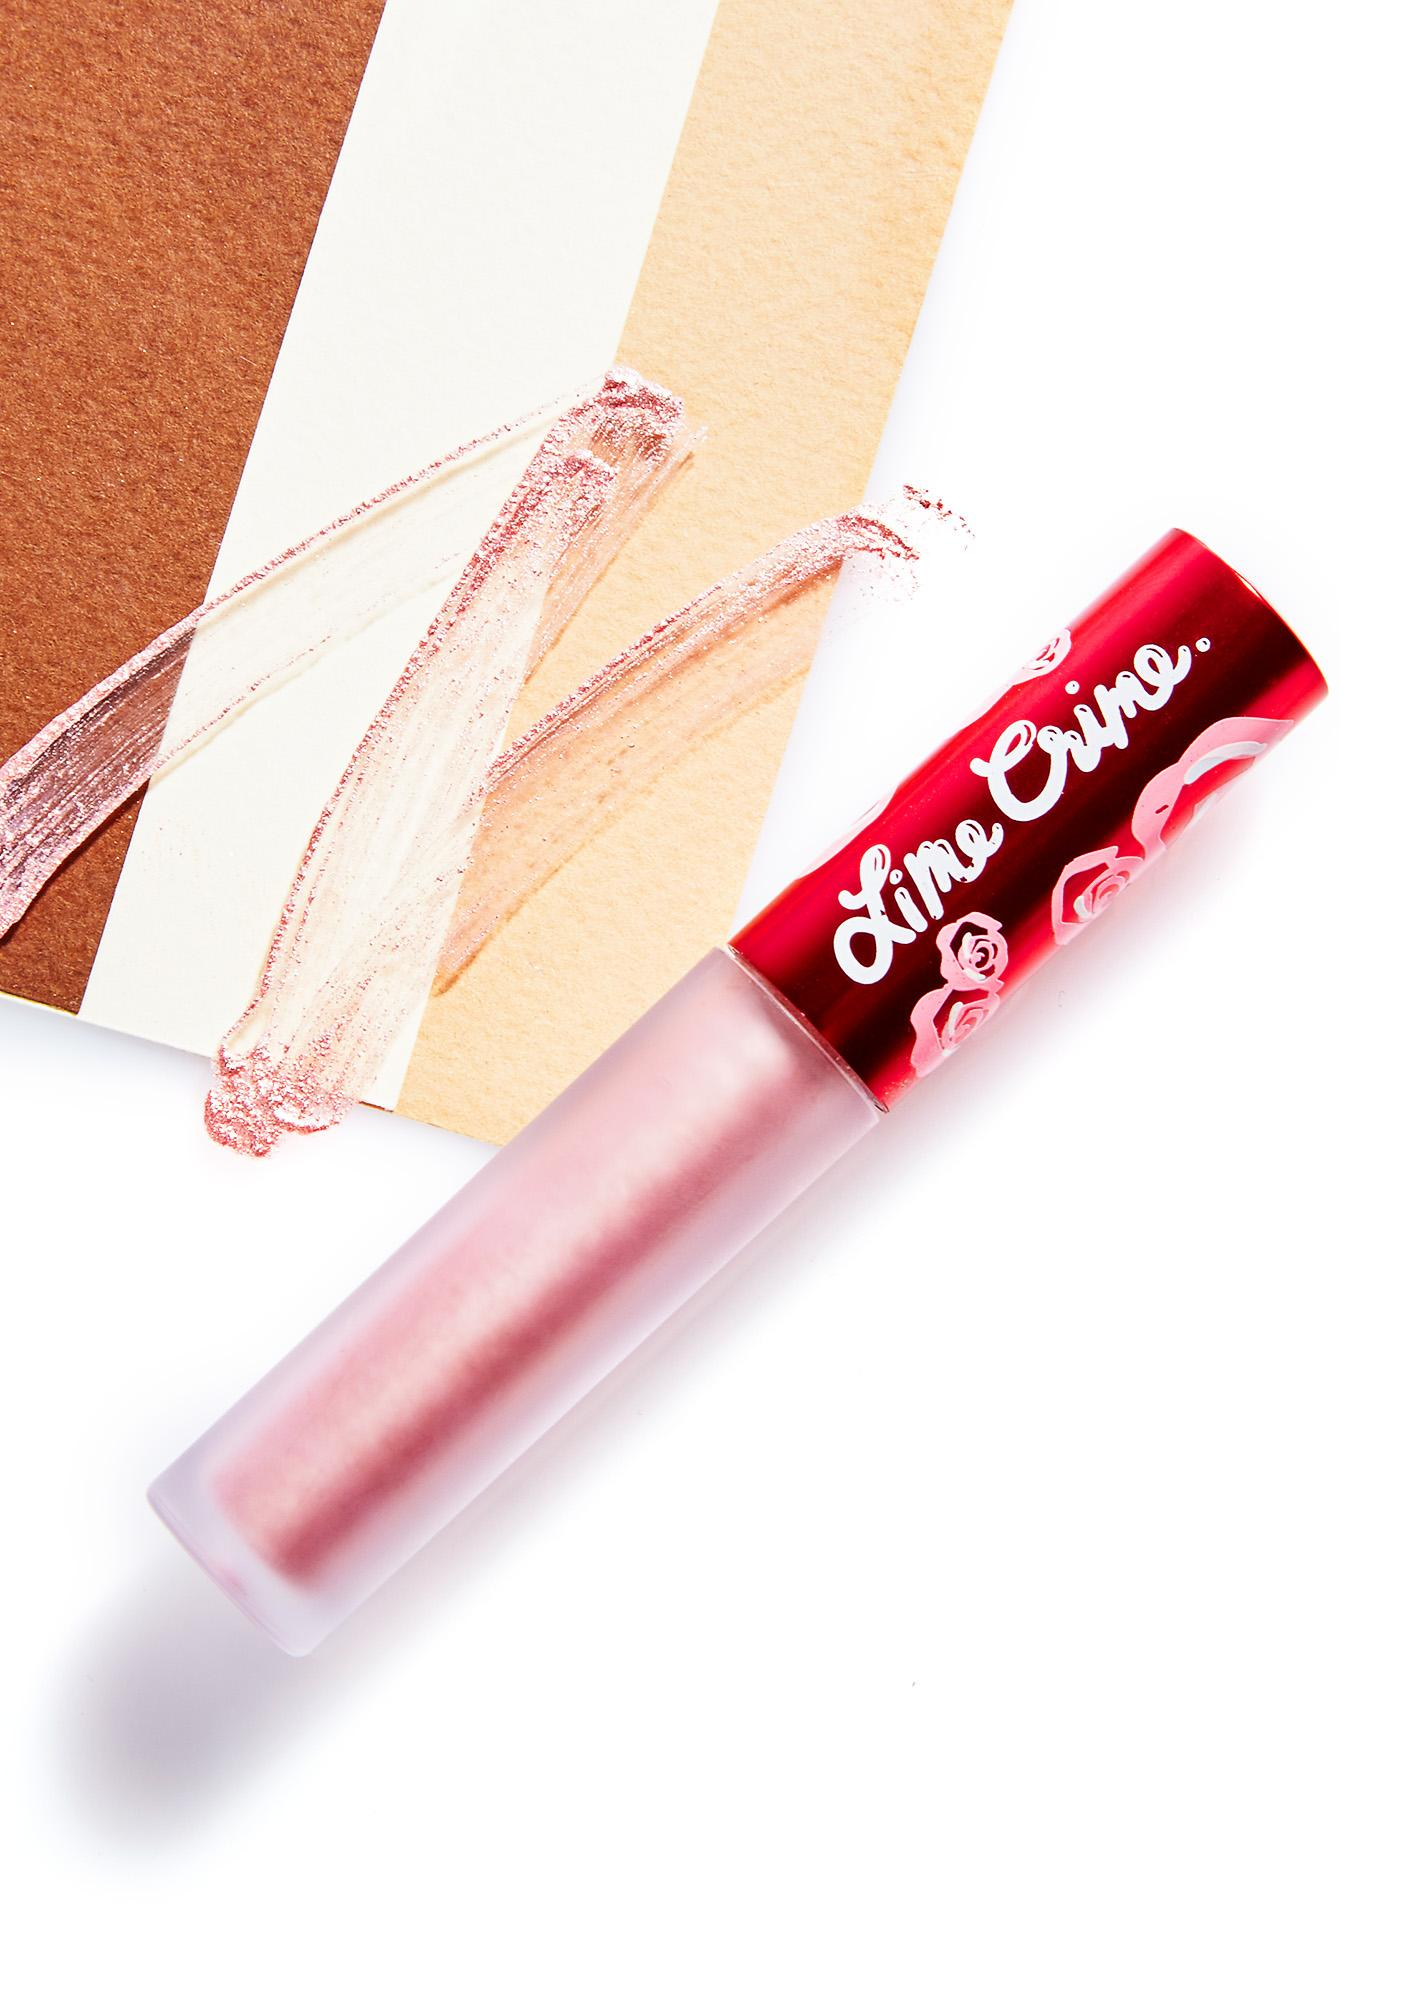 Lime Crime Blondie Metallic Velvetine Liquid Lipstick